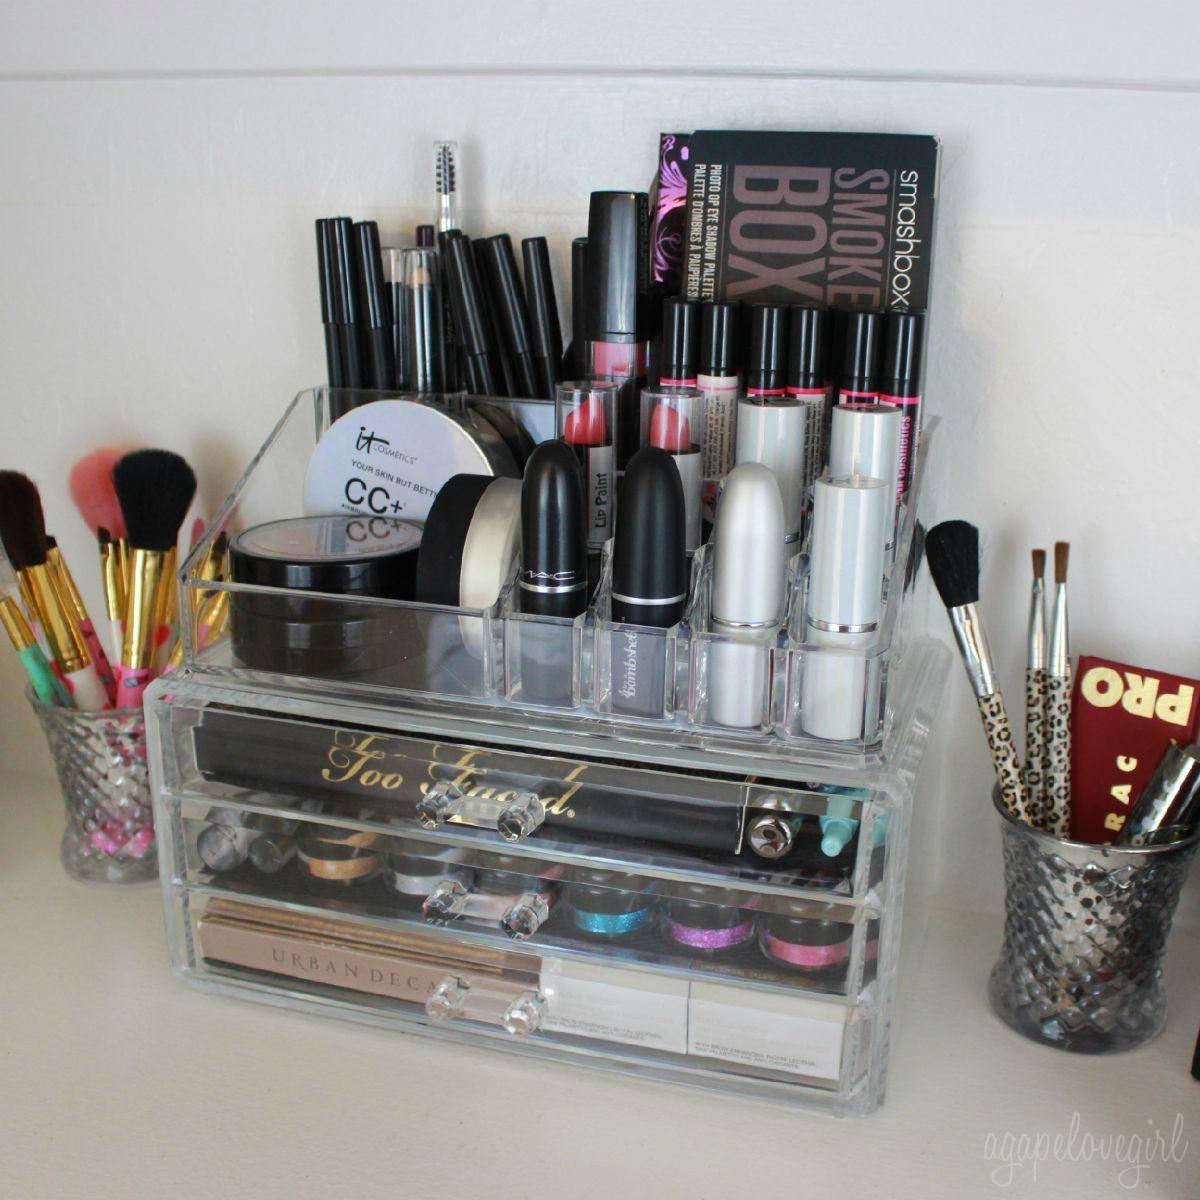 agape love designs makeup storage organizers. Black Bedroom Furniture Sets. Home Design Ideas